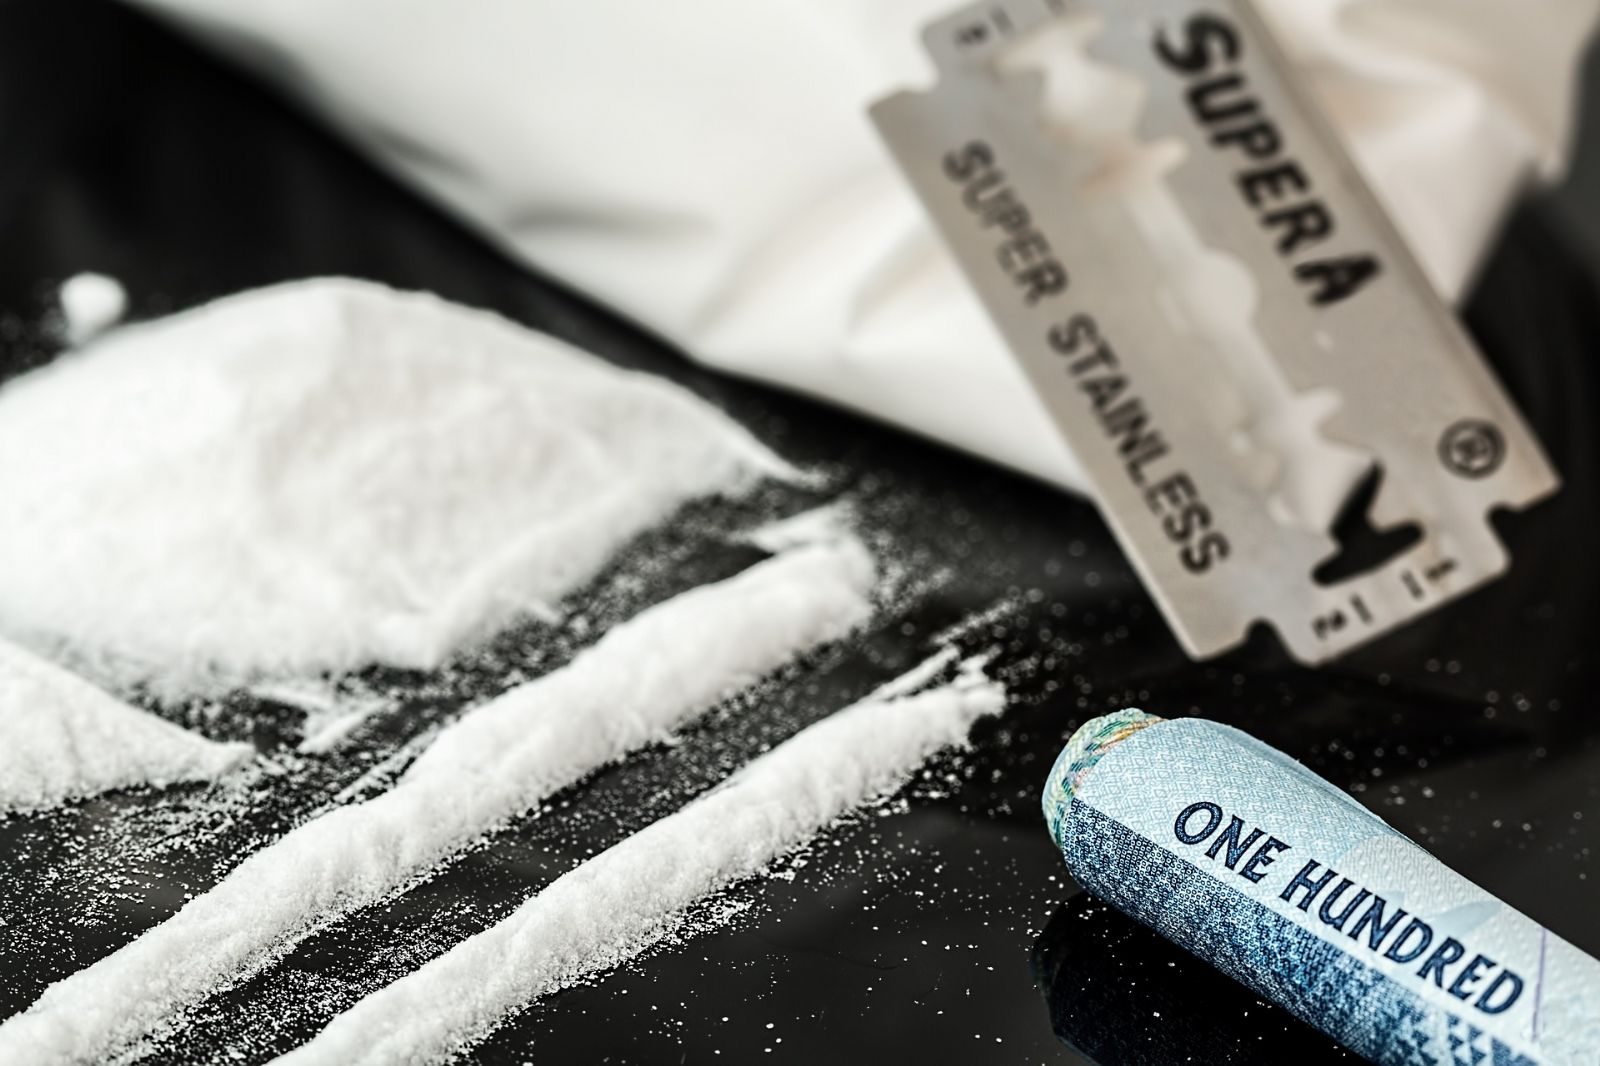 Decomisan 300 kg de cocaína en Michoacán